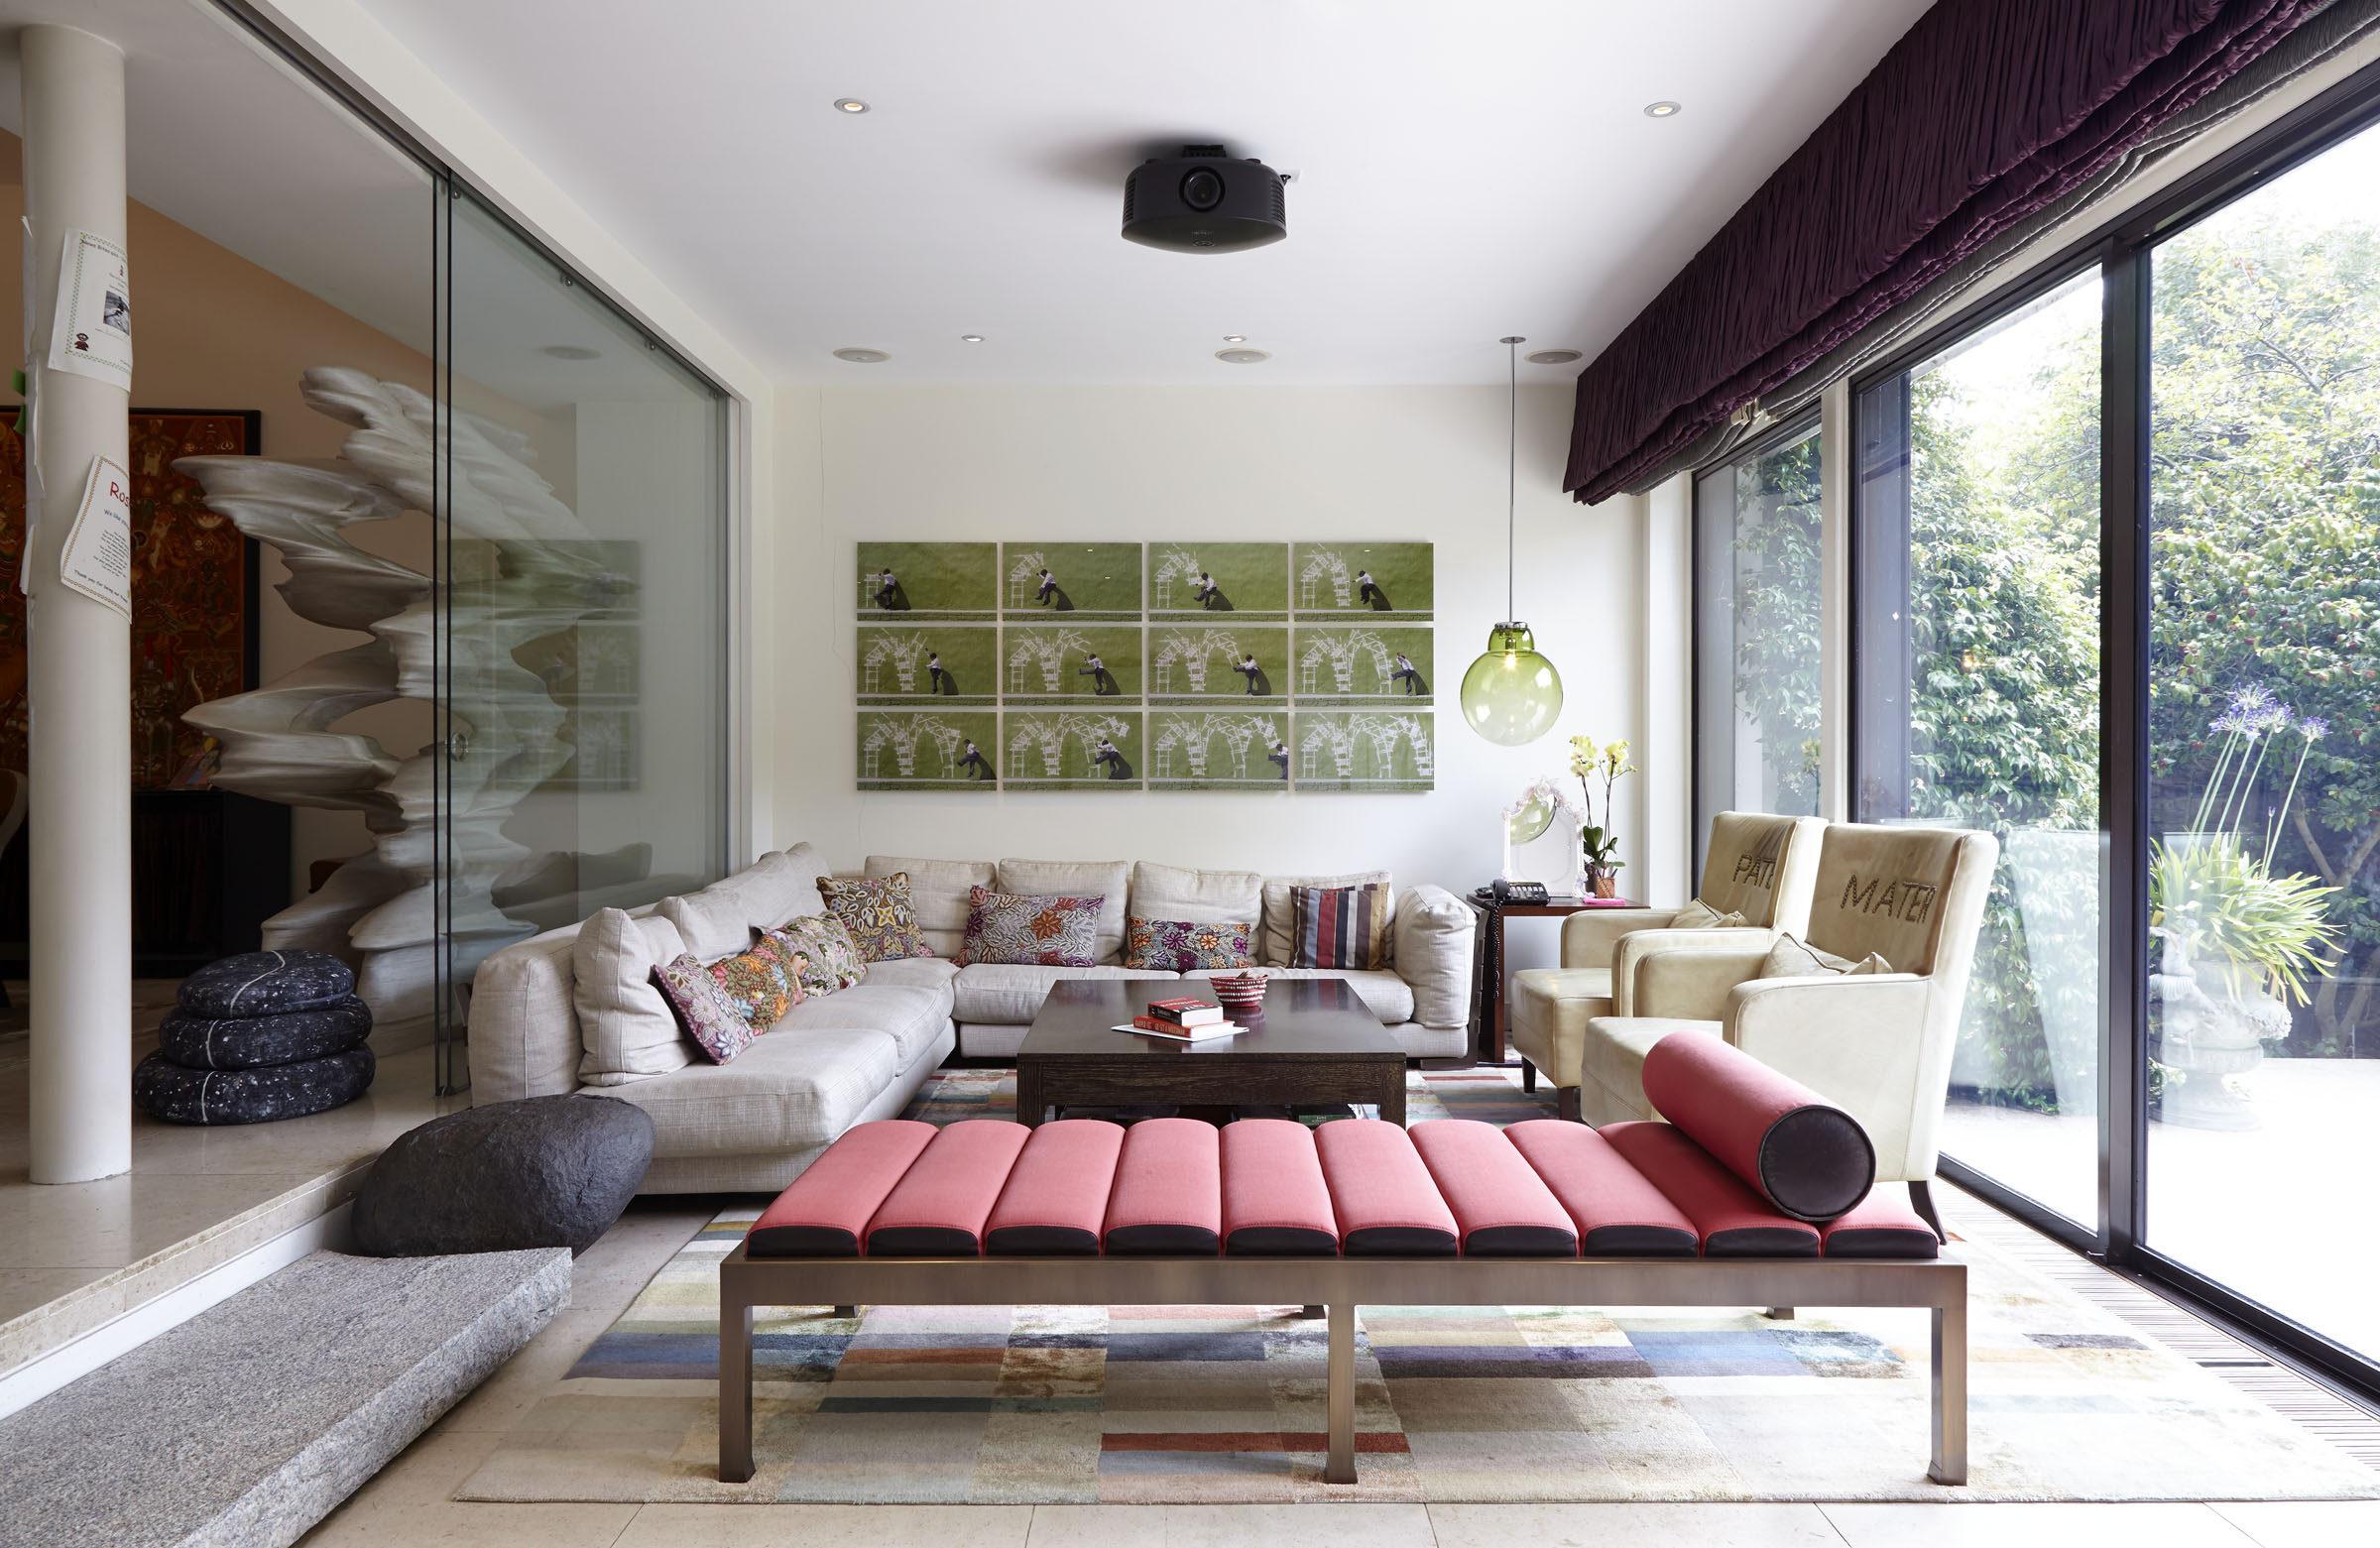 Hamilton terrace home london luxury interior design for 63 hamilton terrace